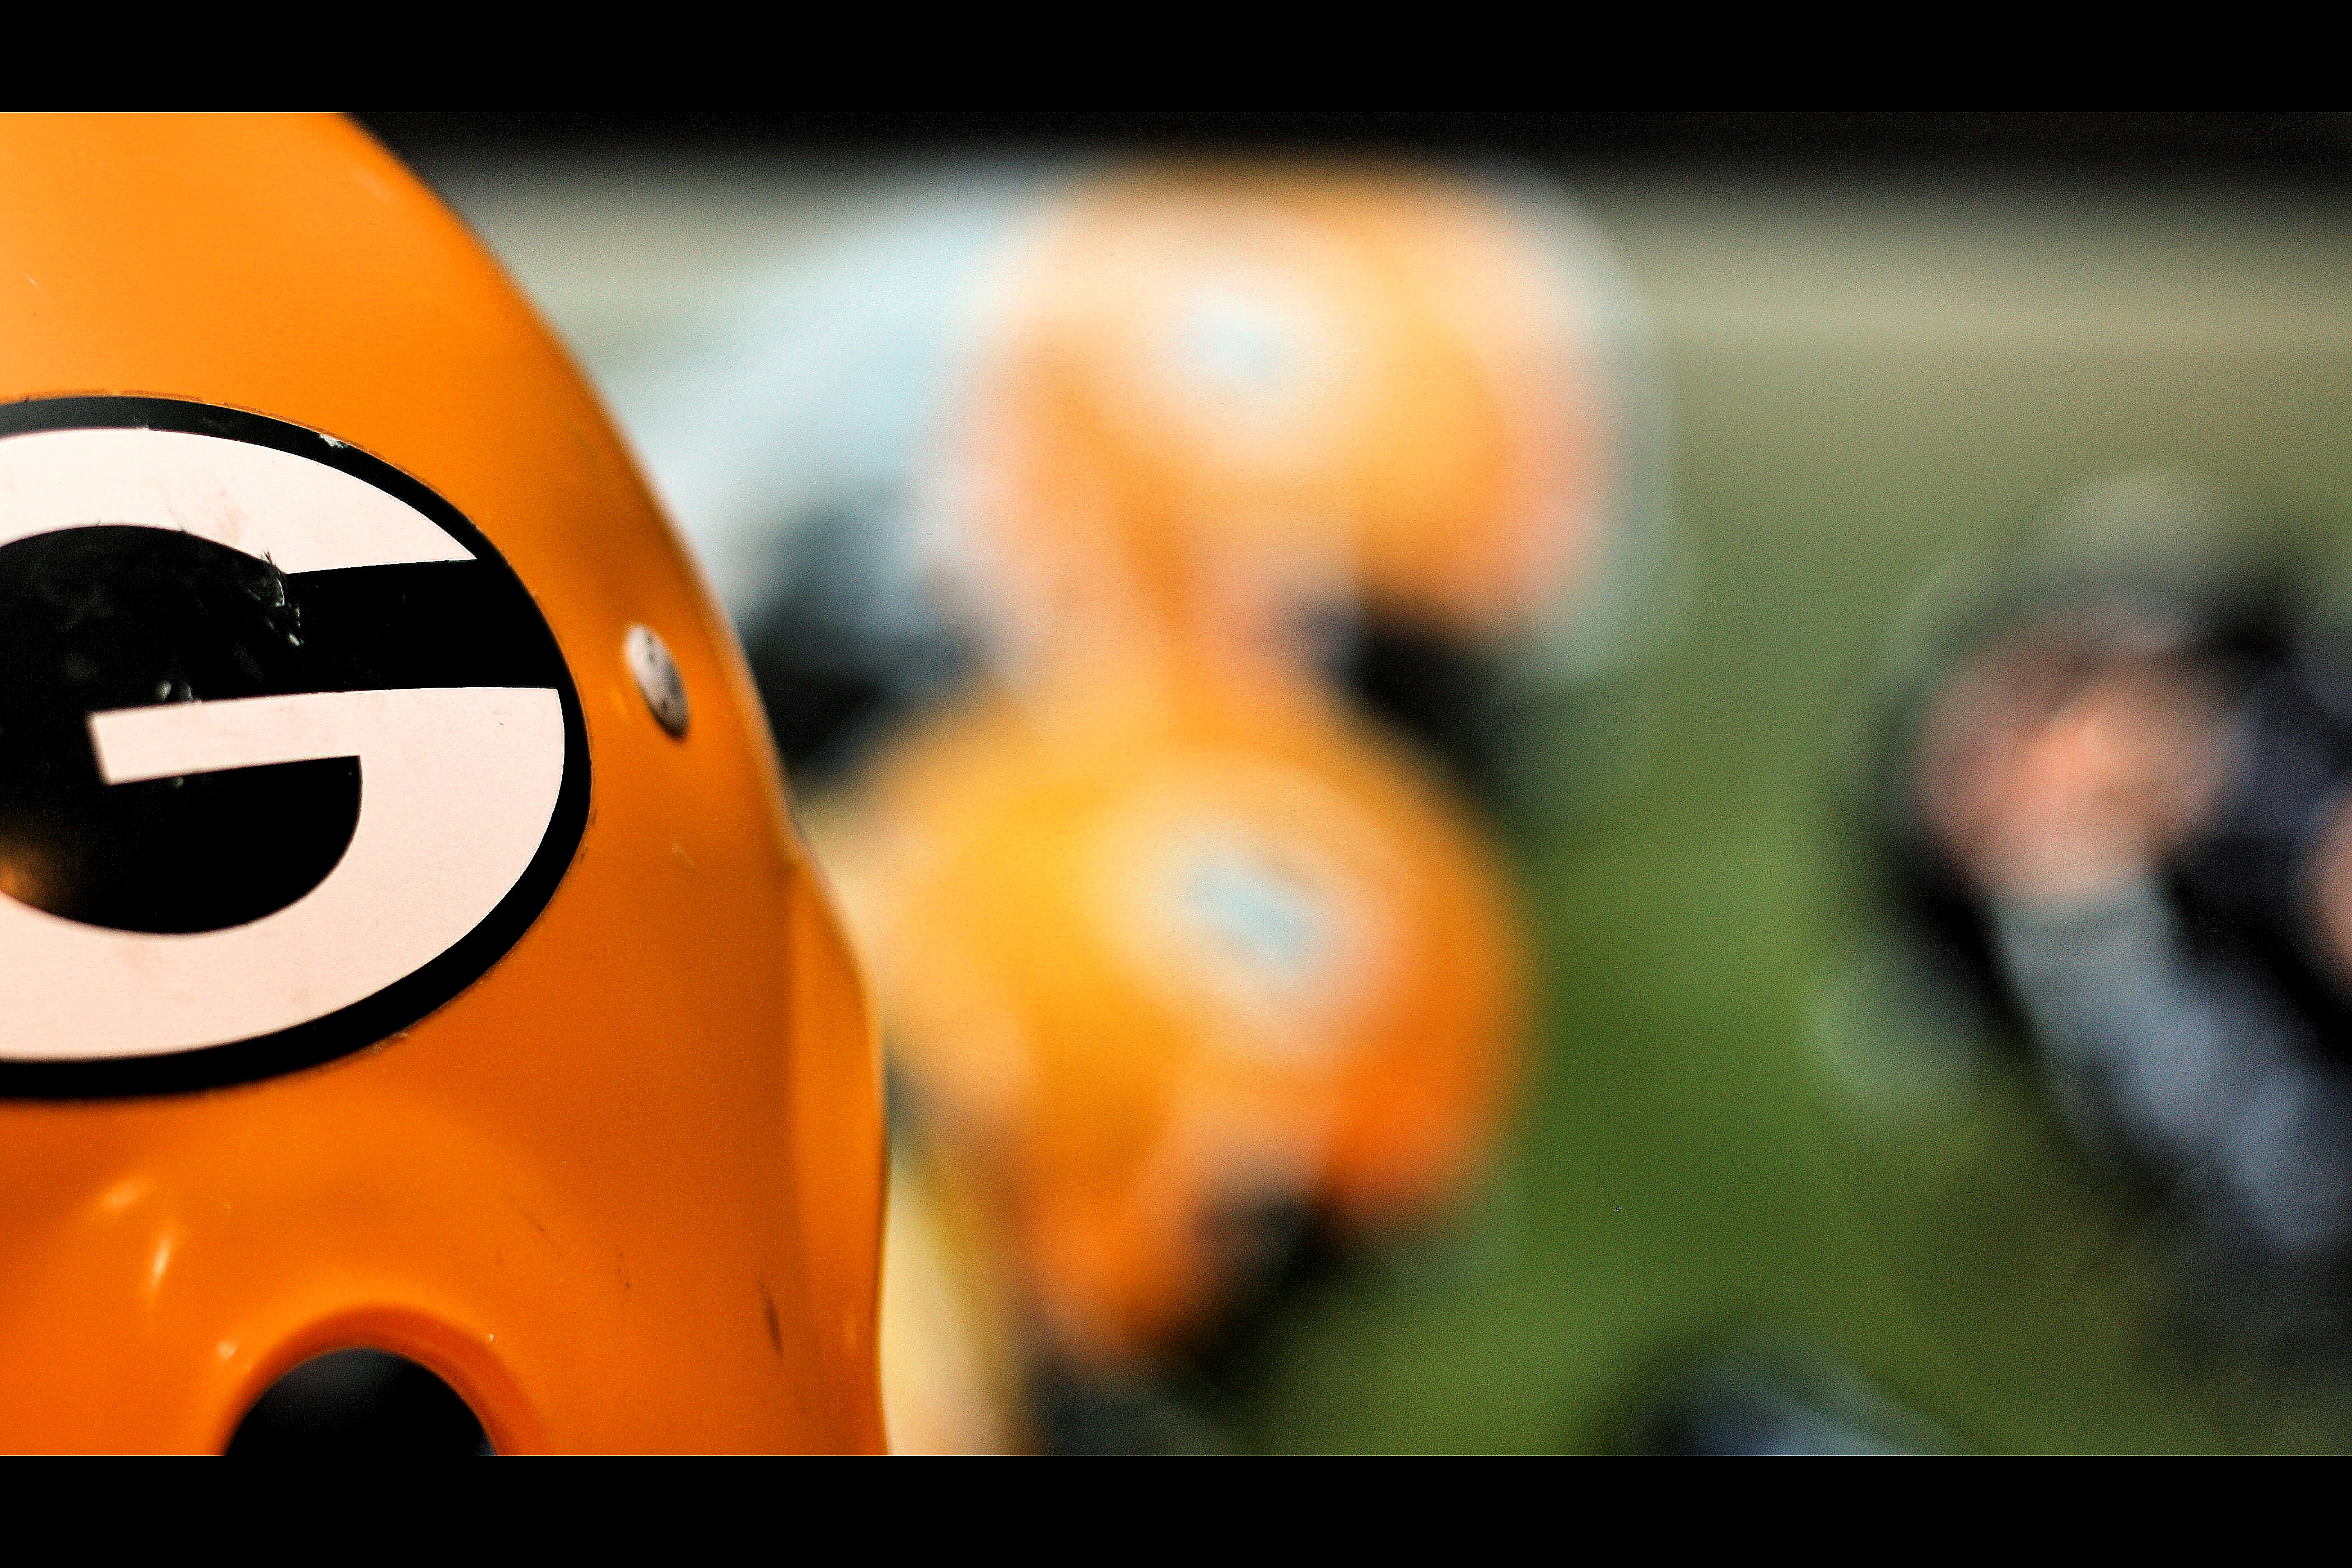 Green Bay Packers Helmet Wallpaper HD Wallpaper Football 4200x2800